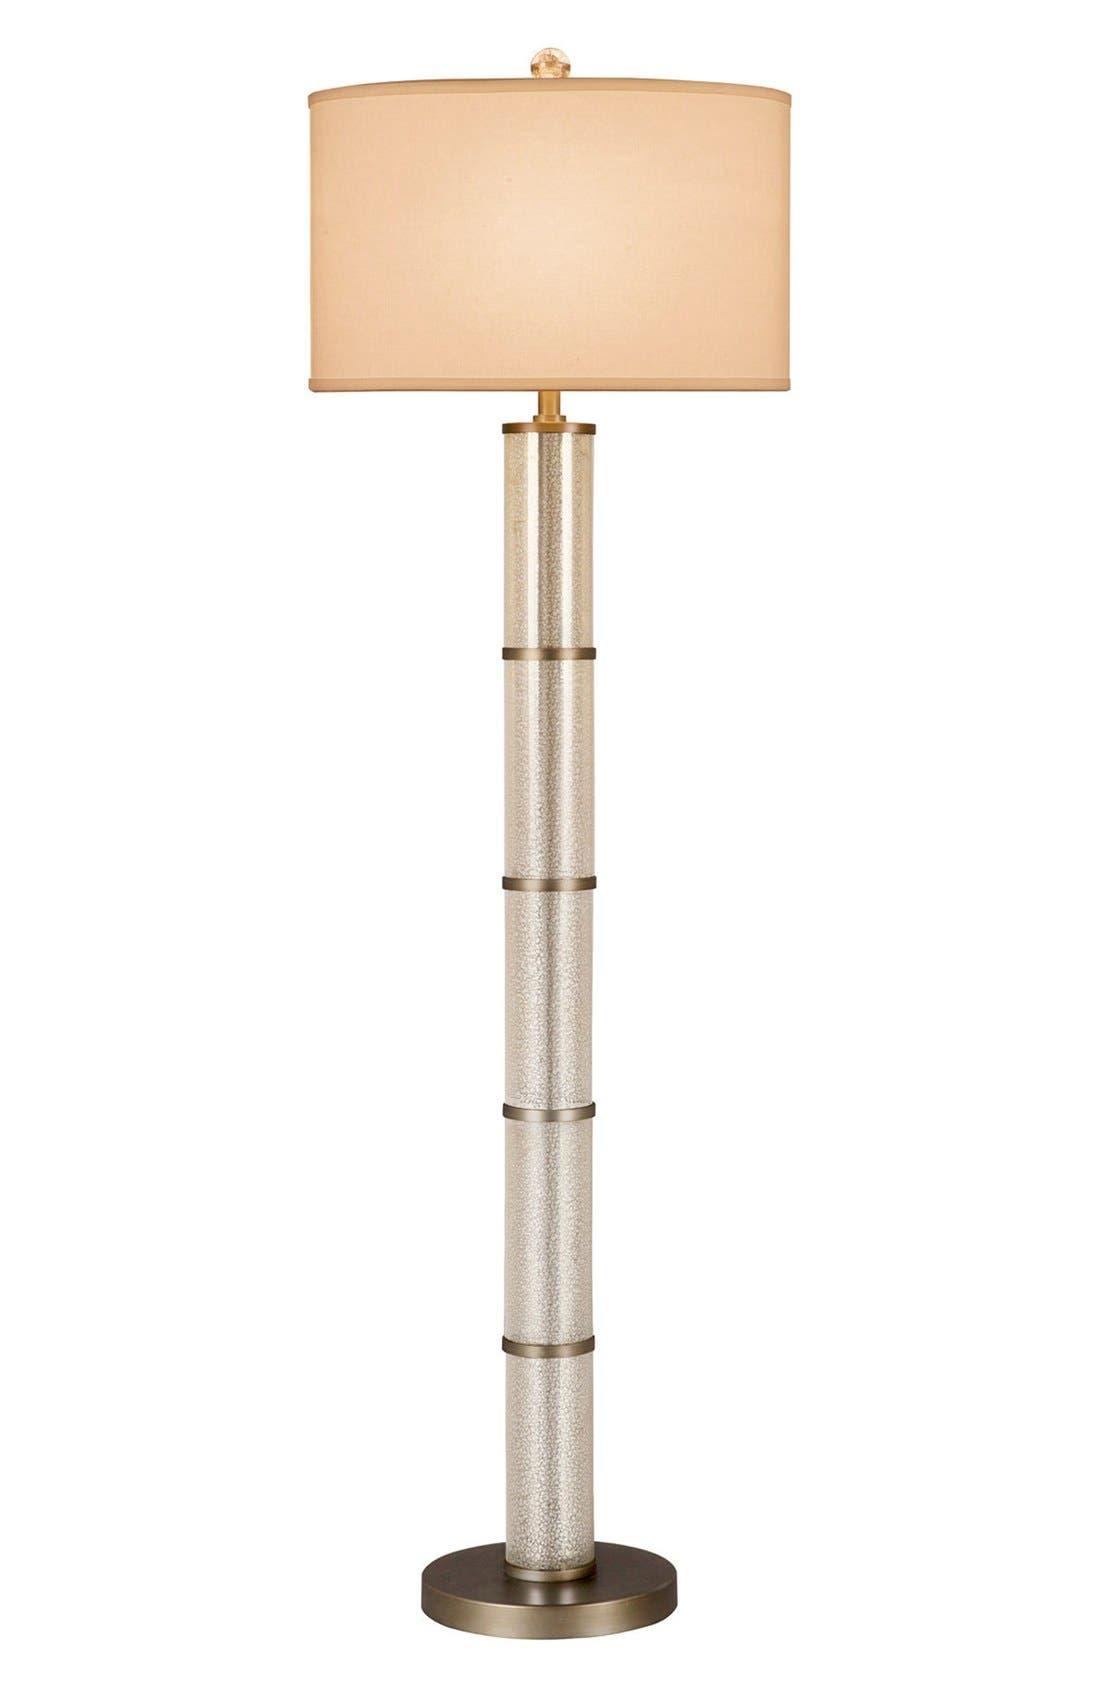 JAlexander Glass Cylinder Floor Lamp,                             Main thumbnail 1, color,                             040